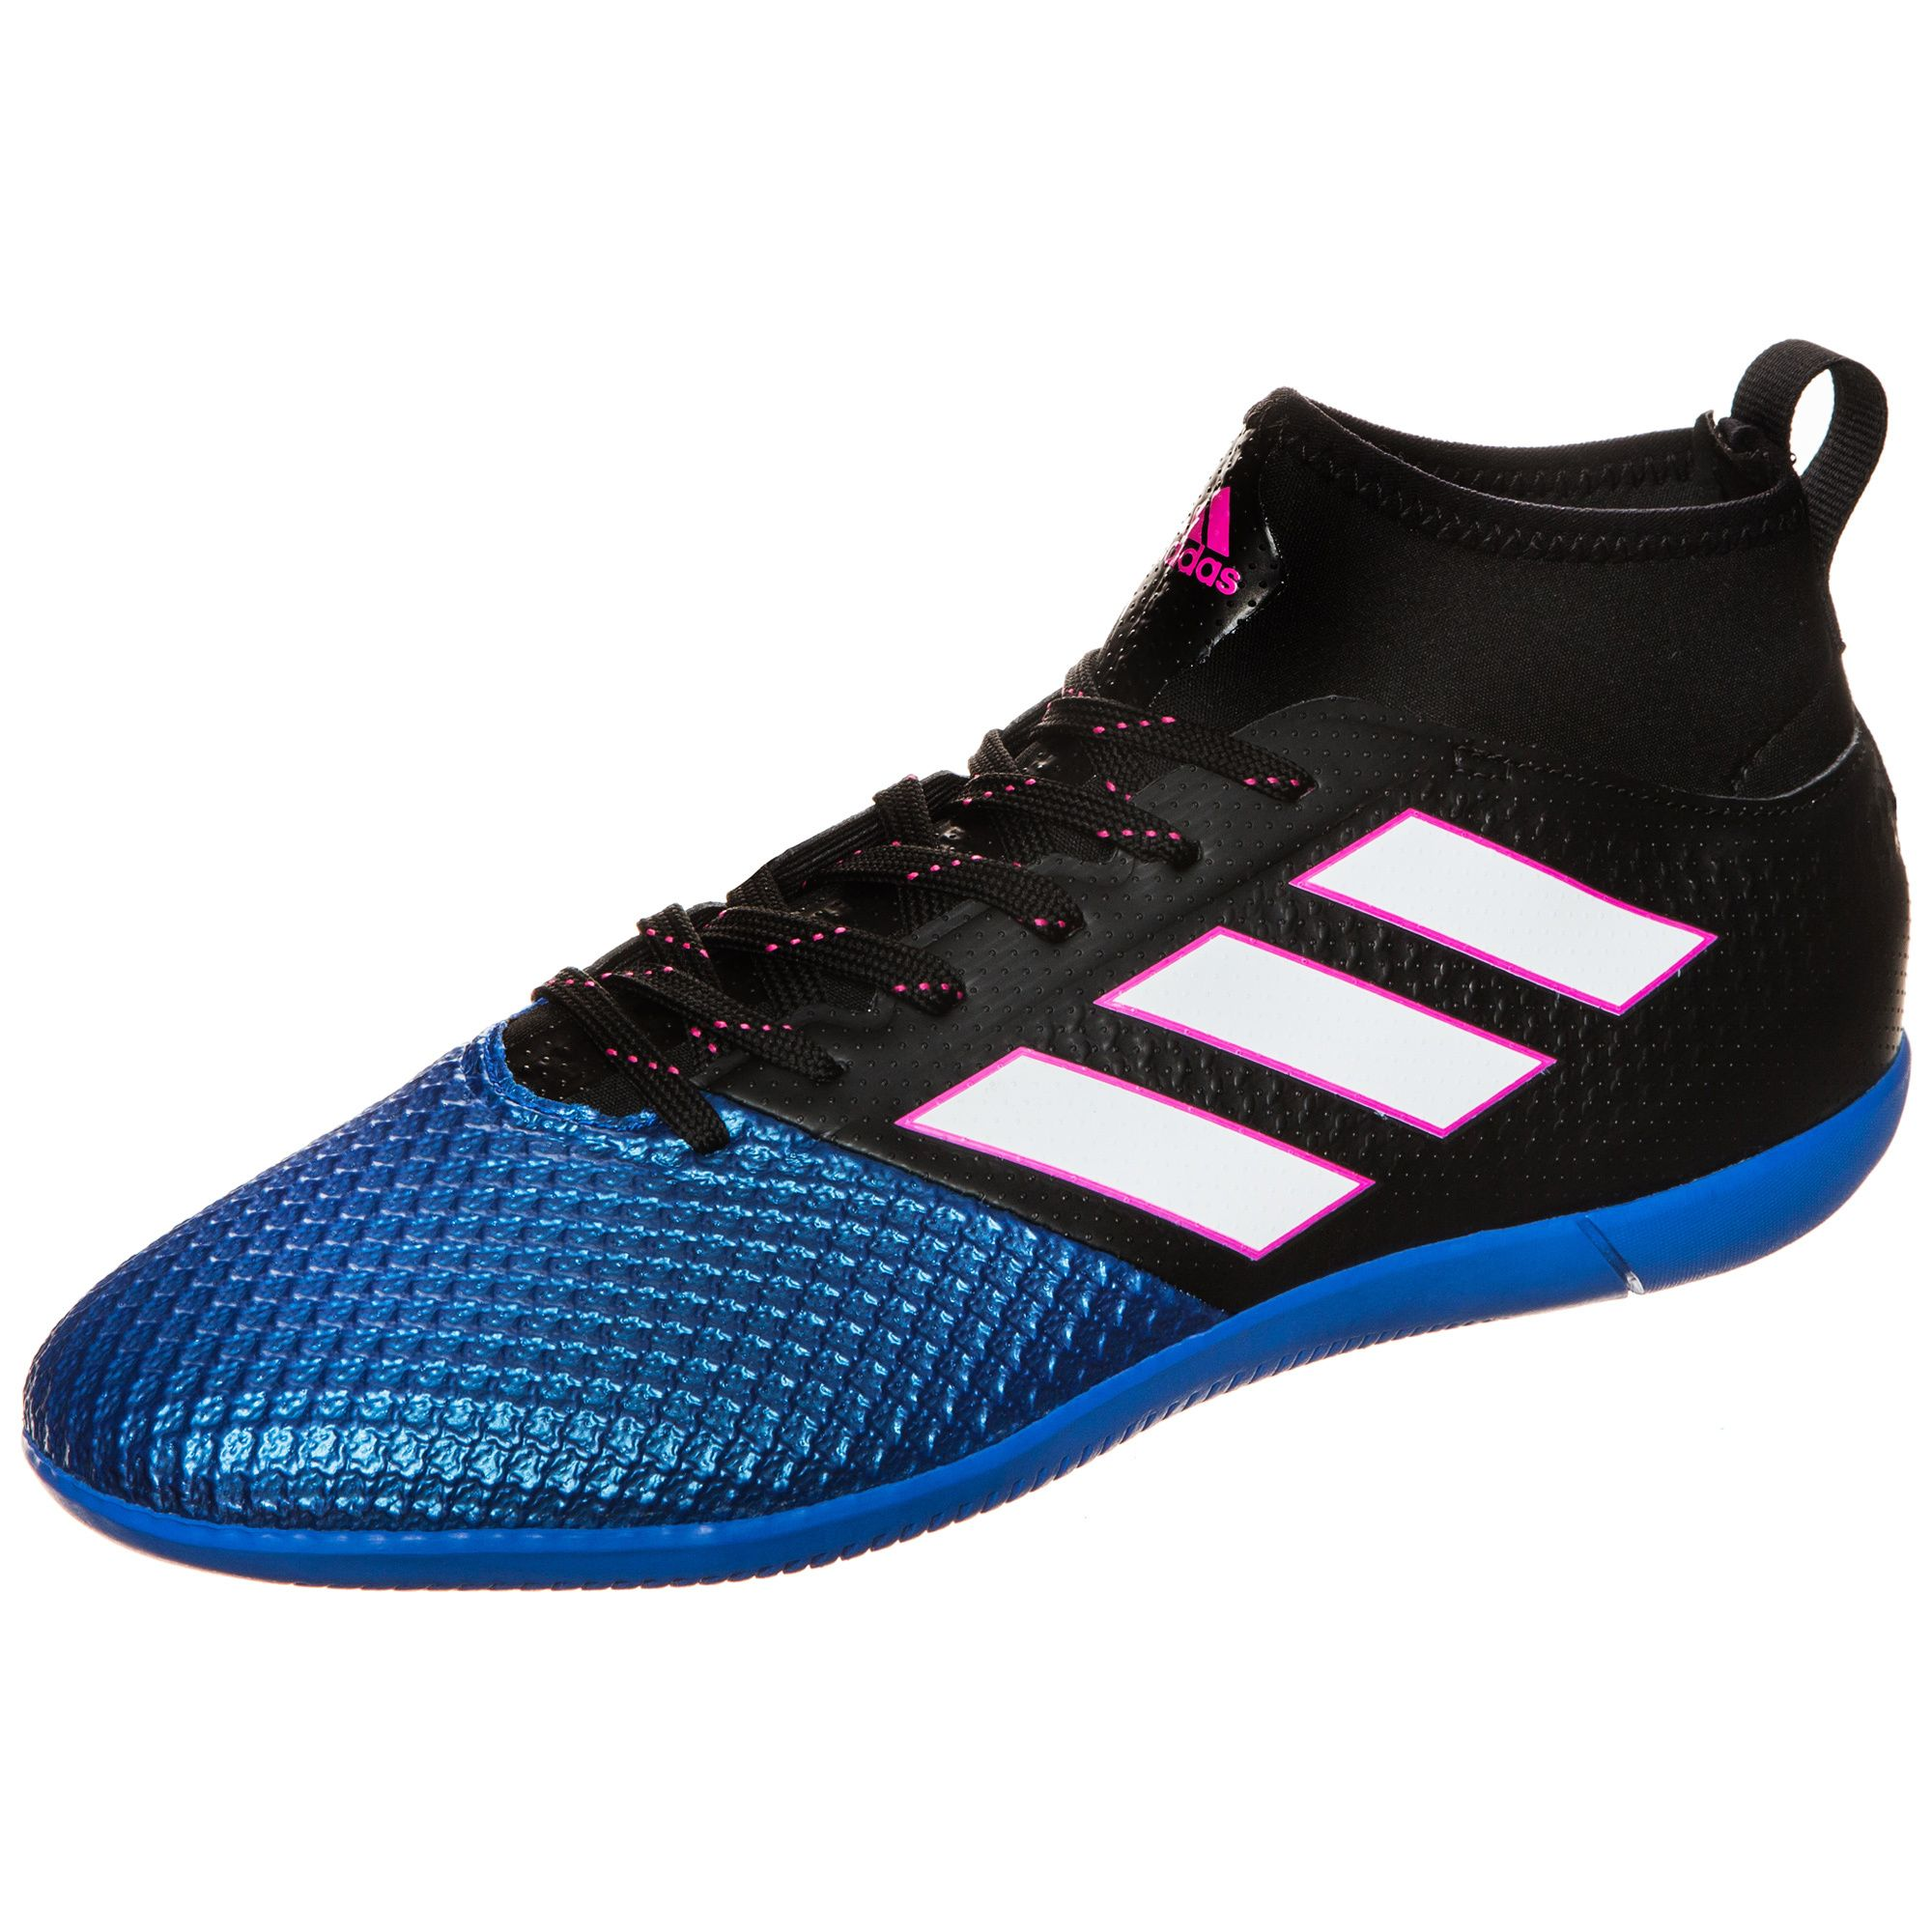 ADIDAS PERFORMANCE adidas Performance ACE 17.3 Primemesh Indoor Fußballschuh Herren